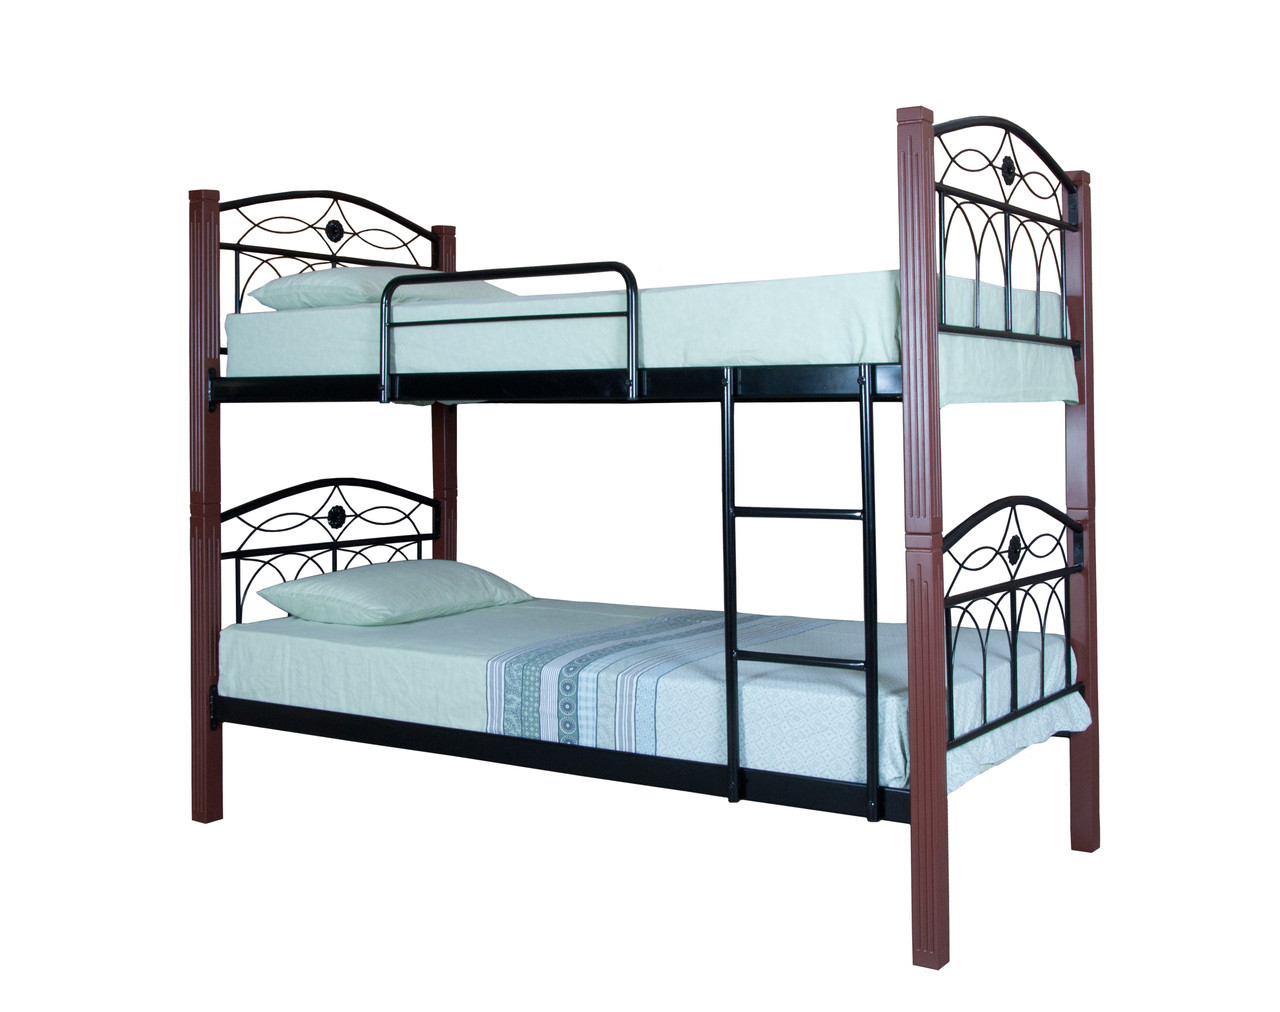 Кровать Элизабет двухъярусная  200х90, черная